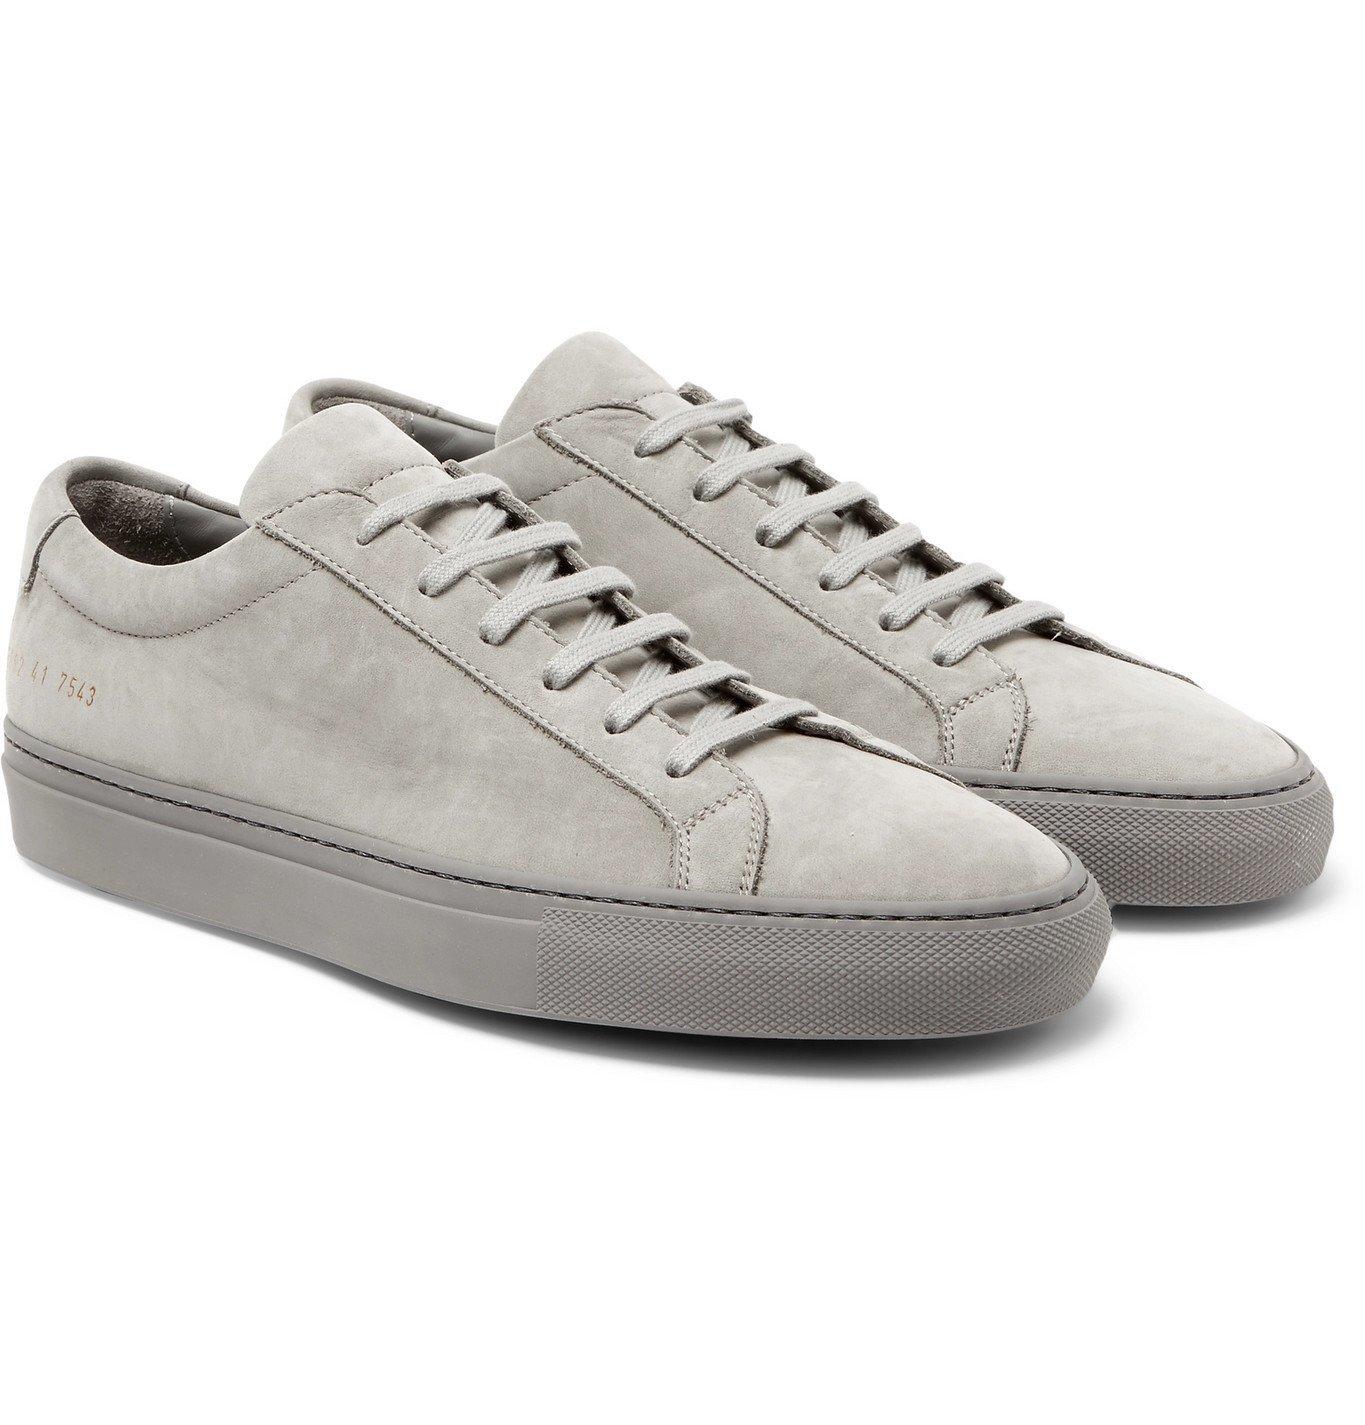 Photo: Common Projects - Original Achilles Nubuck Sneakers - Gray